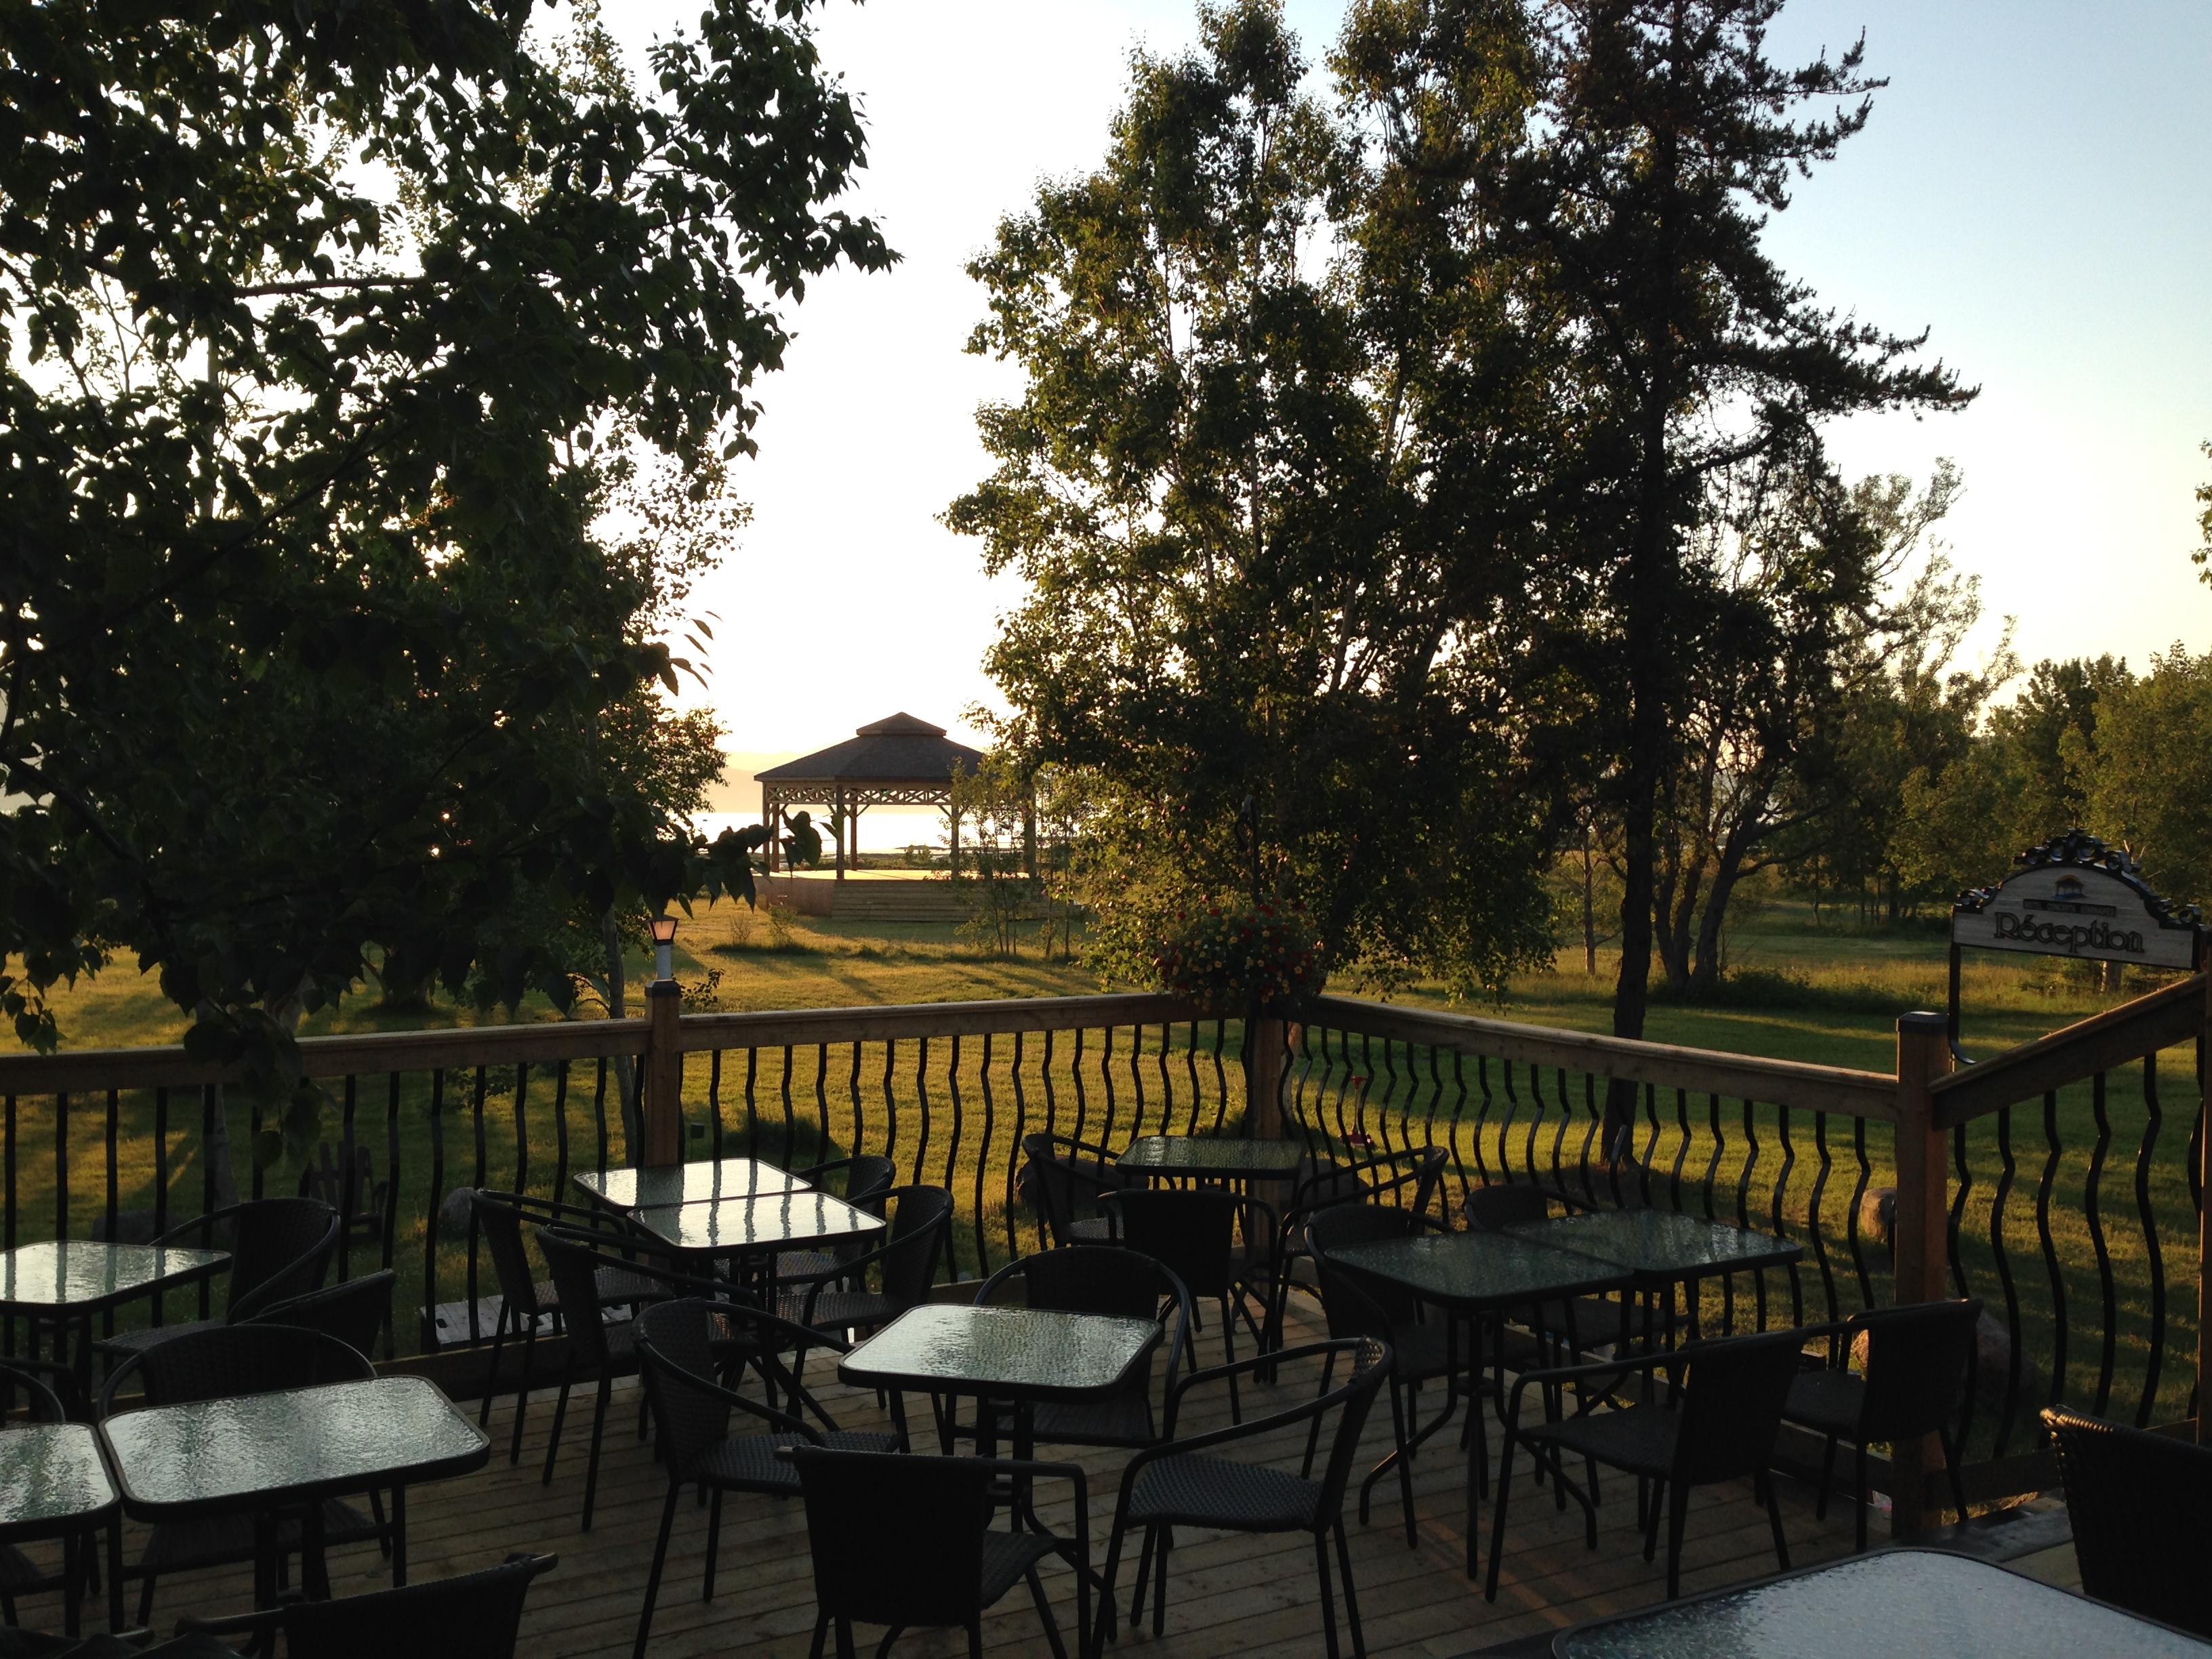 Café terrasse.